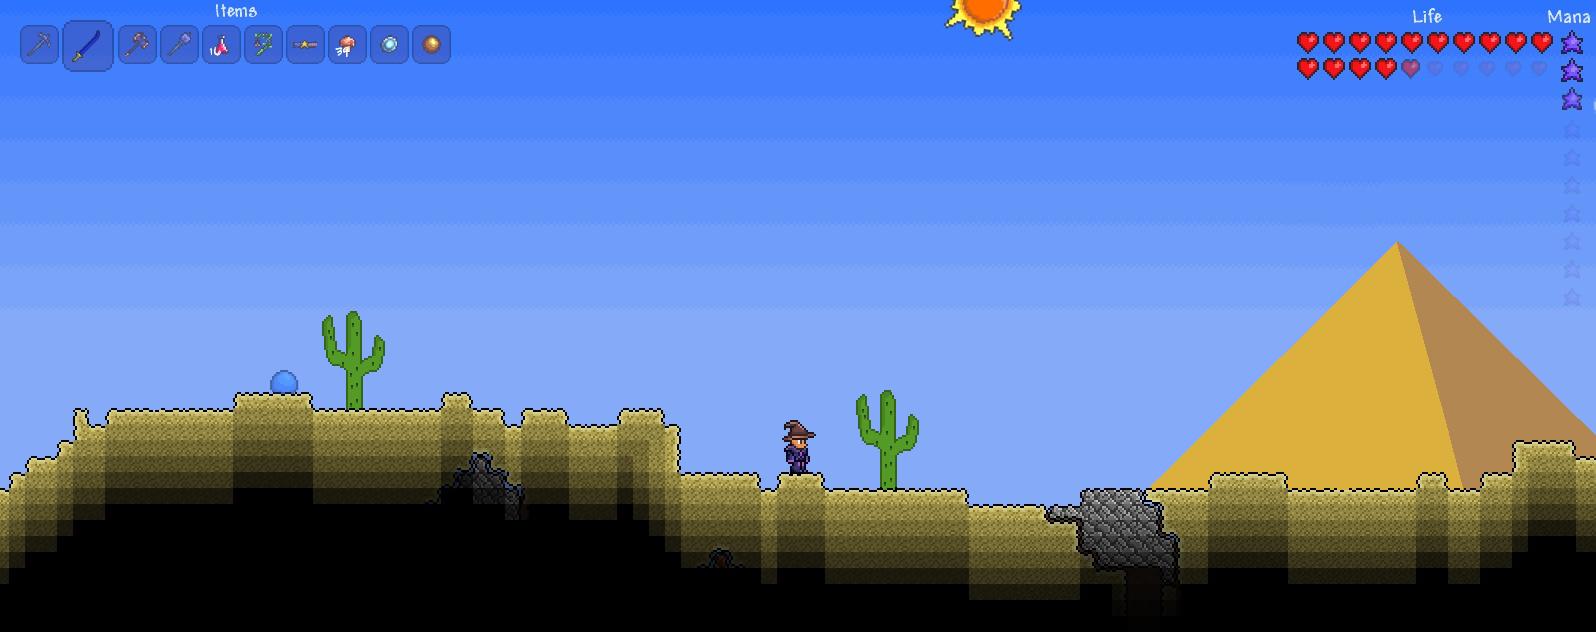 terraria pyramids play terraria online game 試してみる必要が